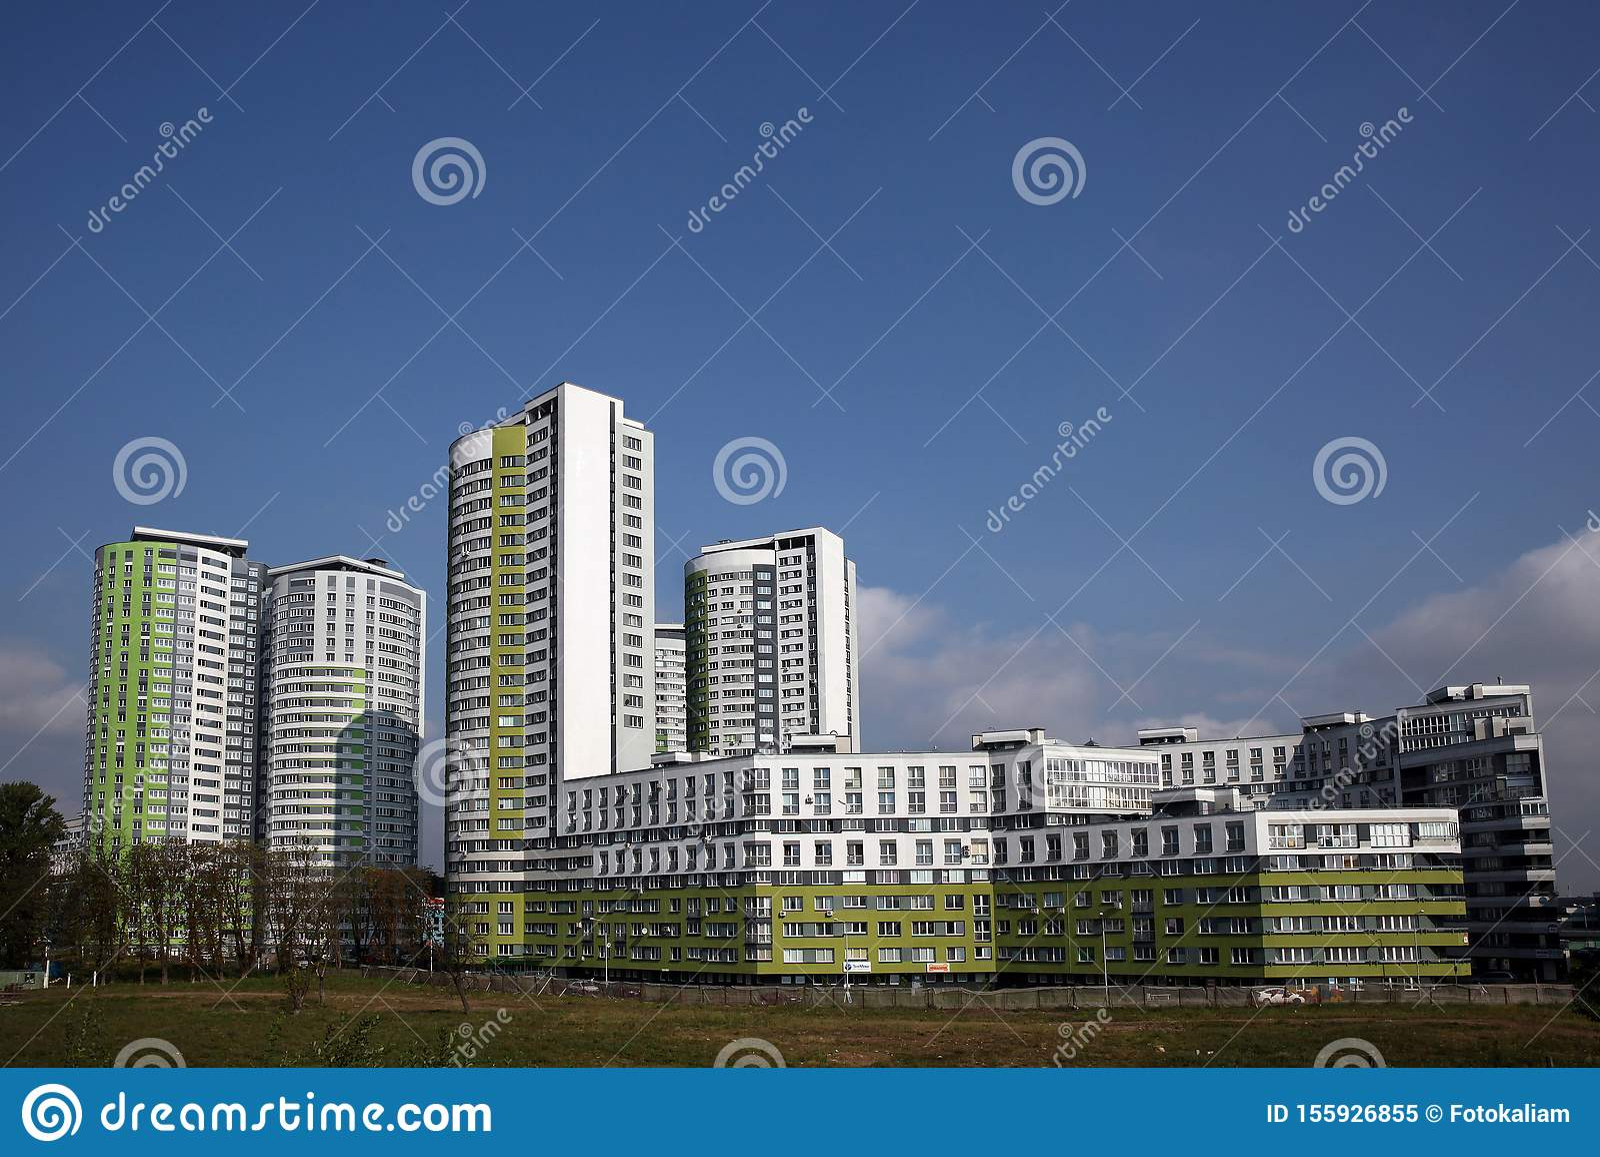 Multi-storey residential buildings on Skryganova Street